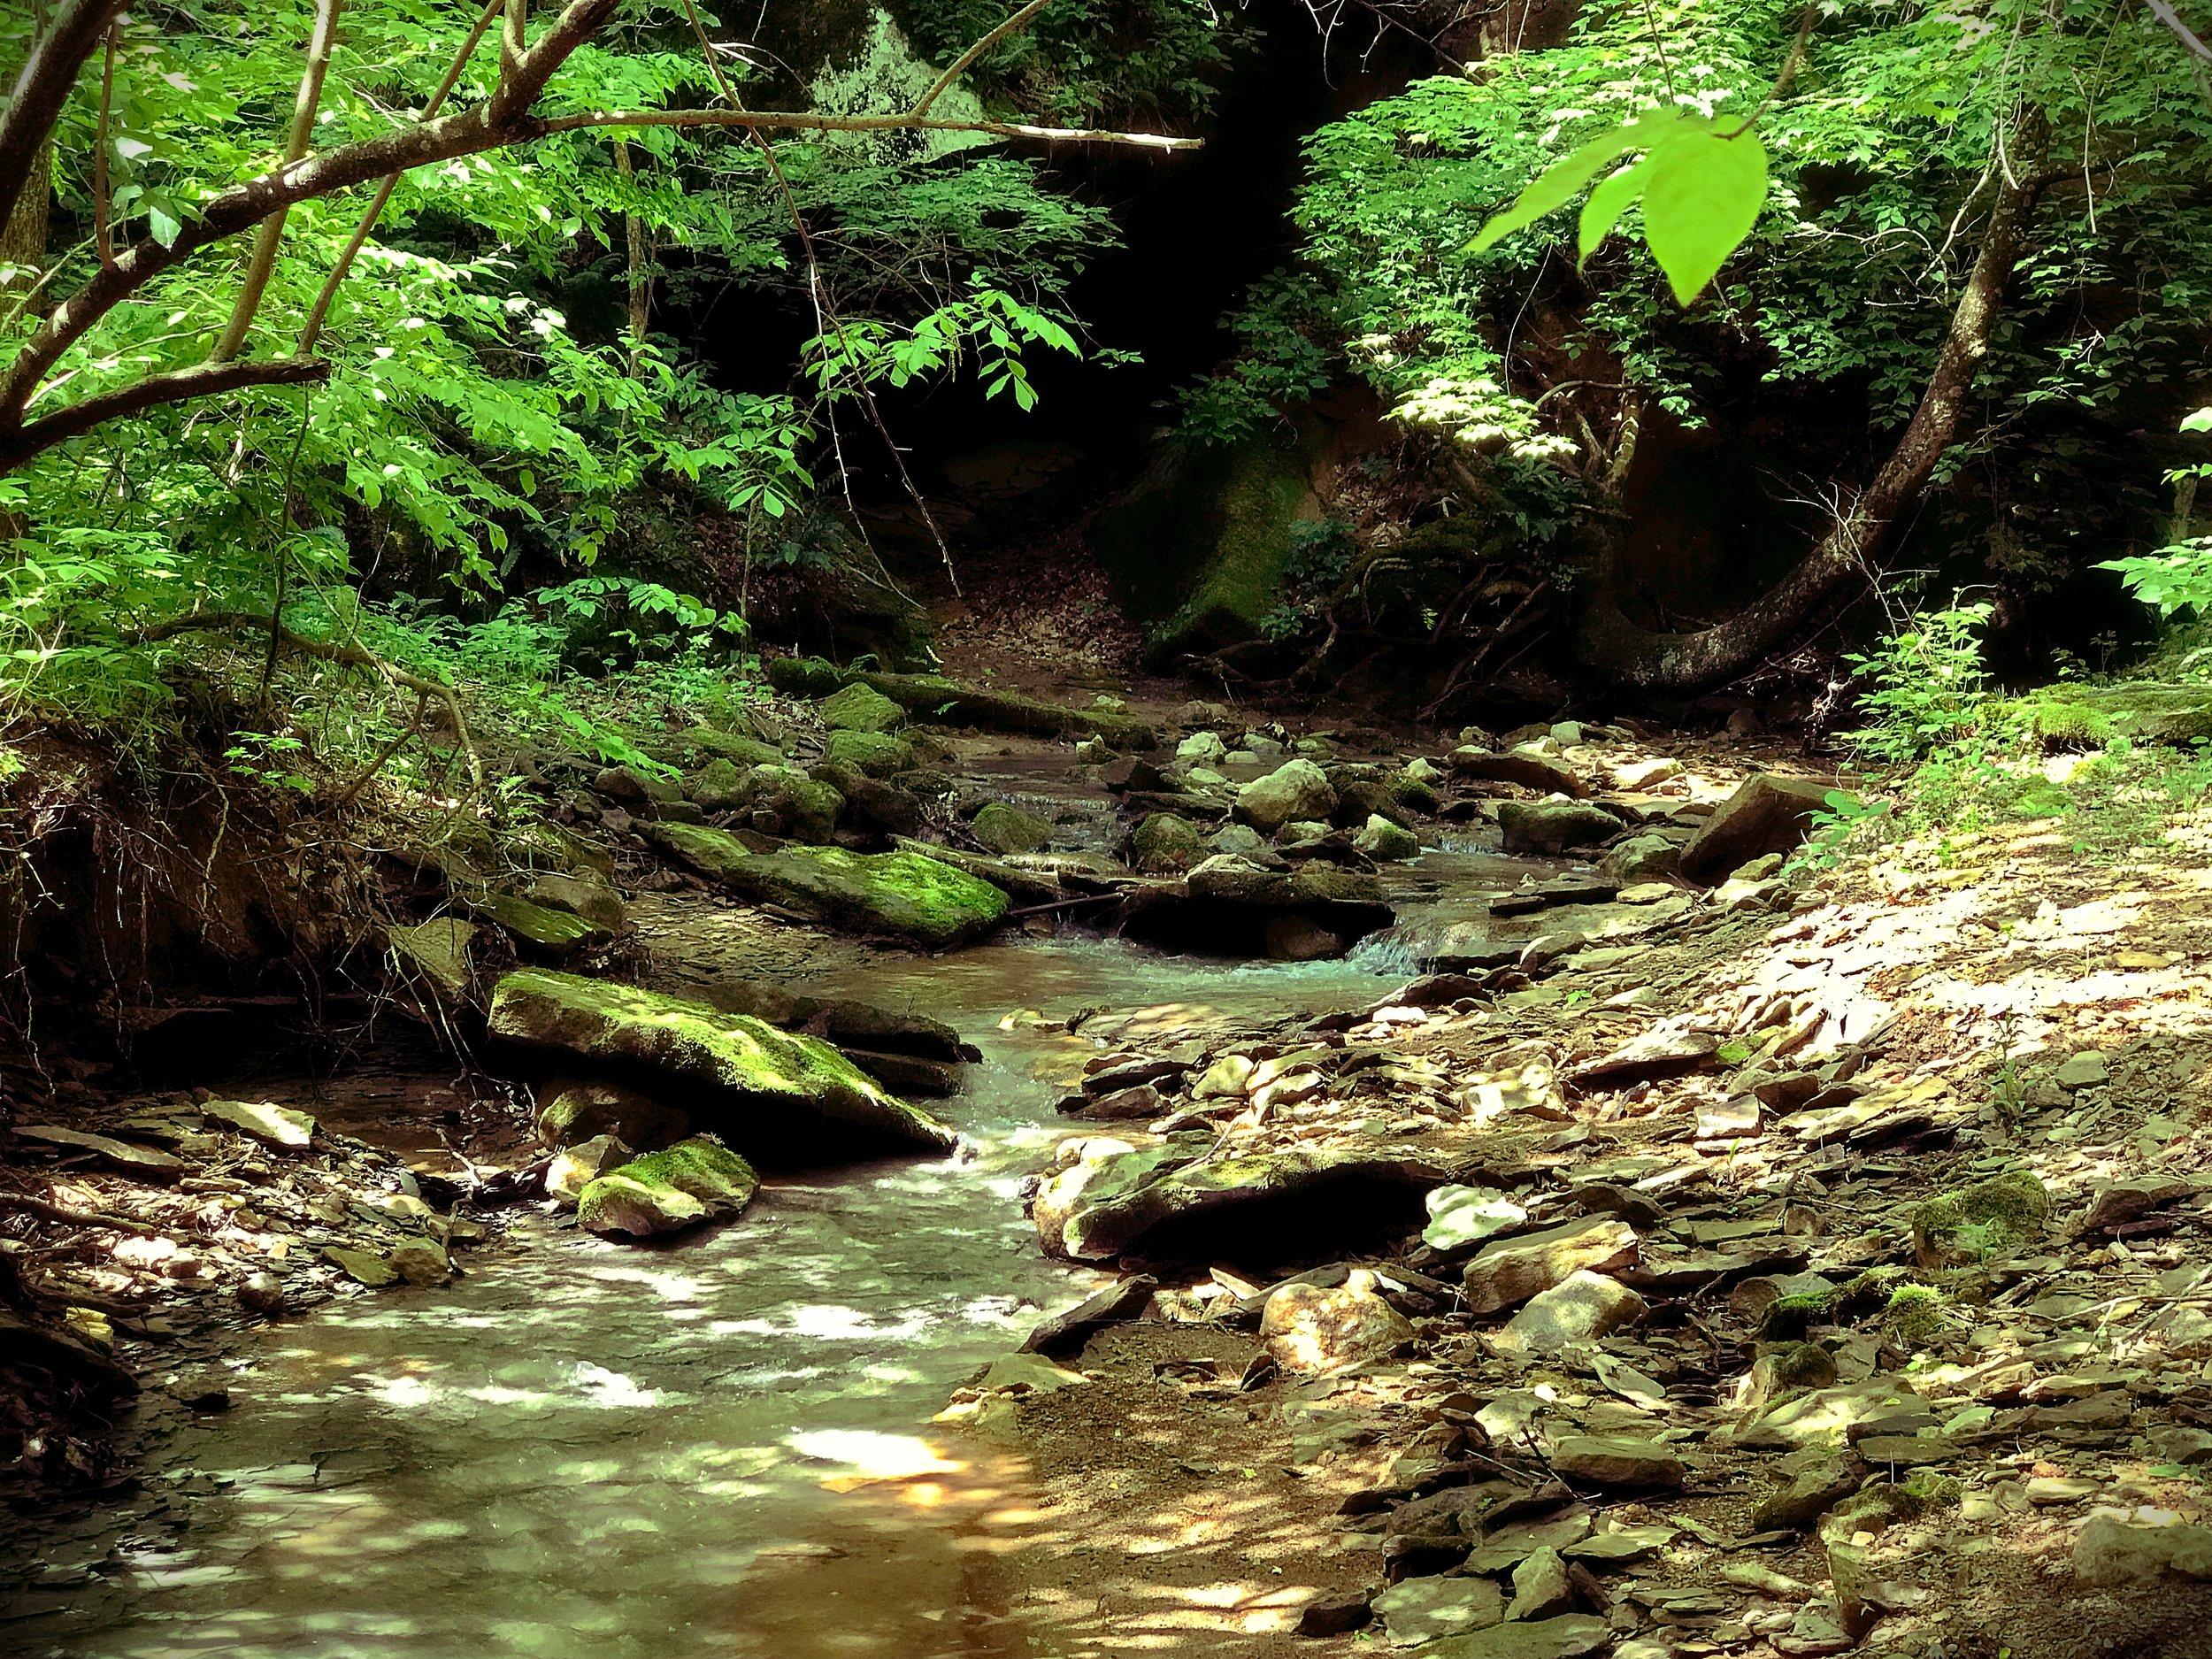 Crone's Creek, SuBAMUH, Athens County, OH. Photo: Erika Galentin